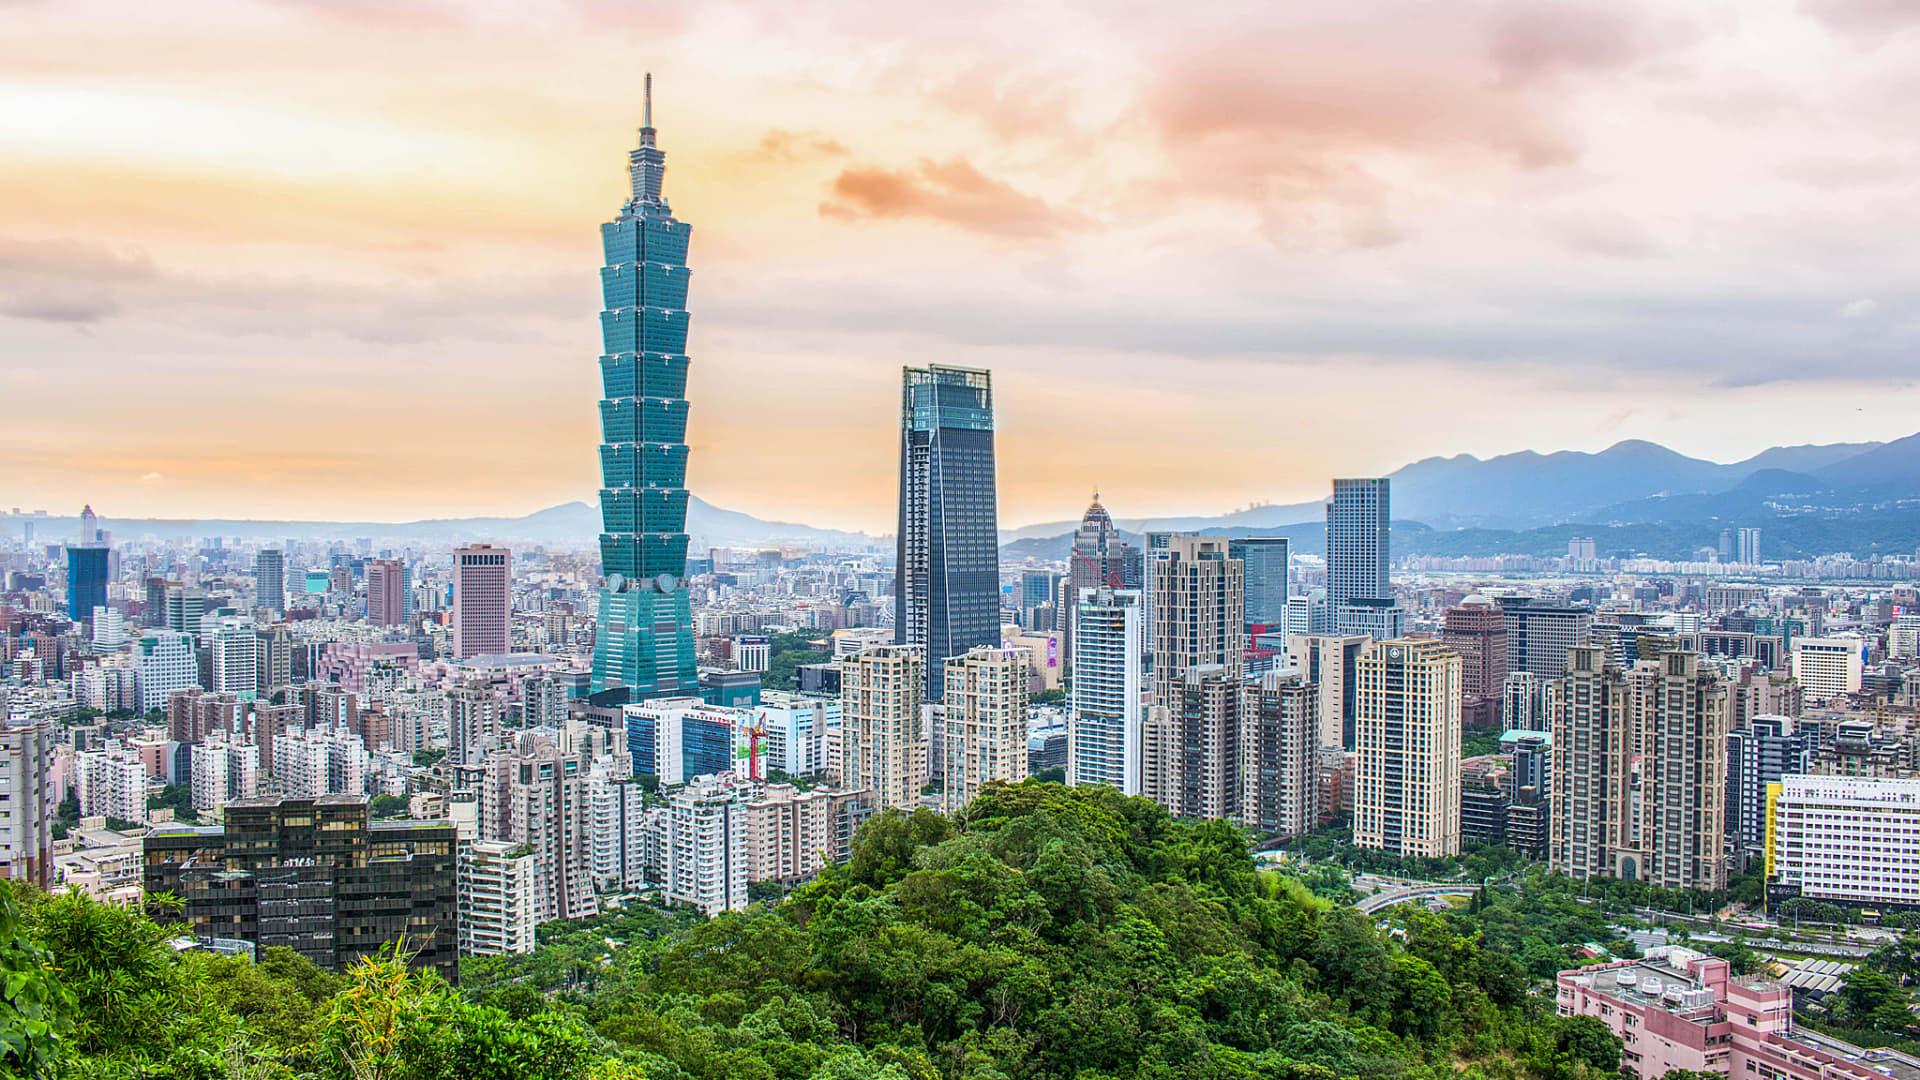 High-rise buildings sprawl out across the Taiwanese capital Taipei.